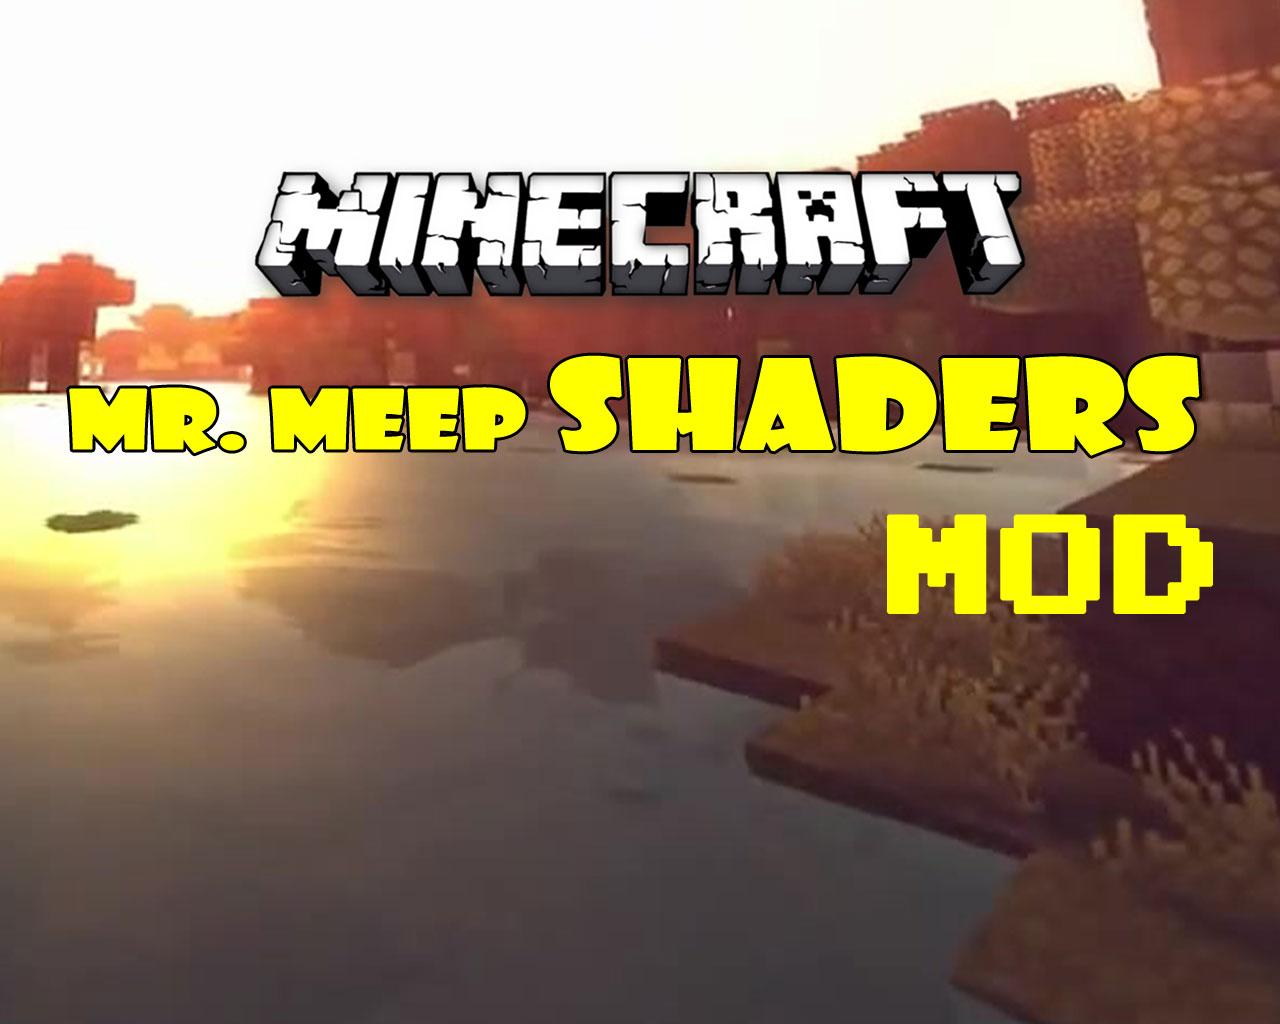 MrMeep_x3's Shaders Mod 1.12.2/1.11.2